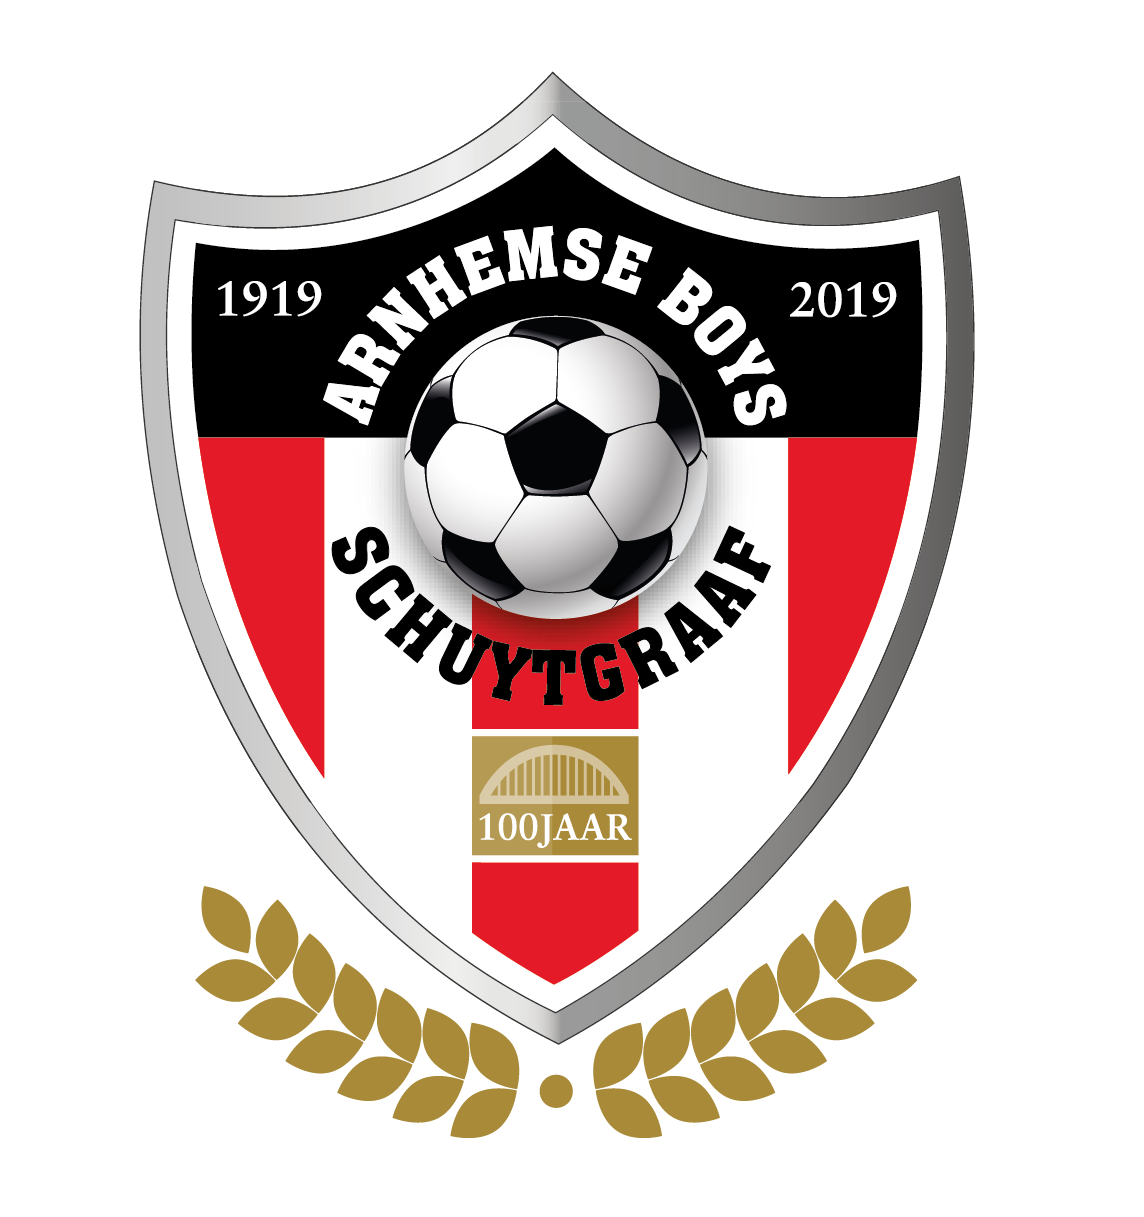 Jubileum Logo 100 jaar Arnhemse Boys Schuytgraaf